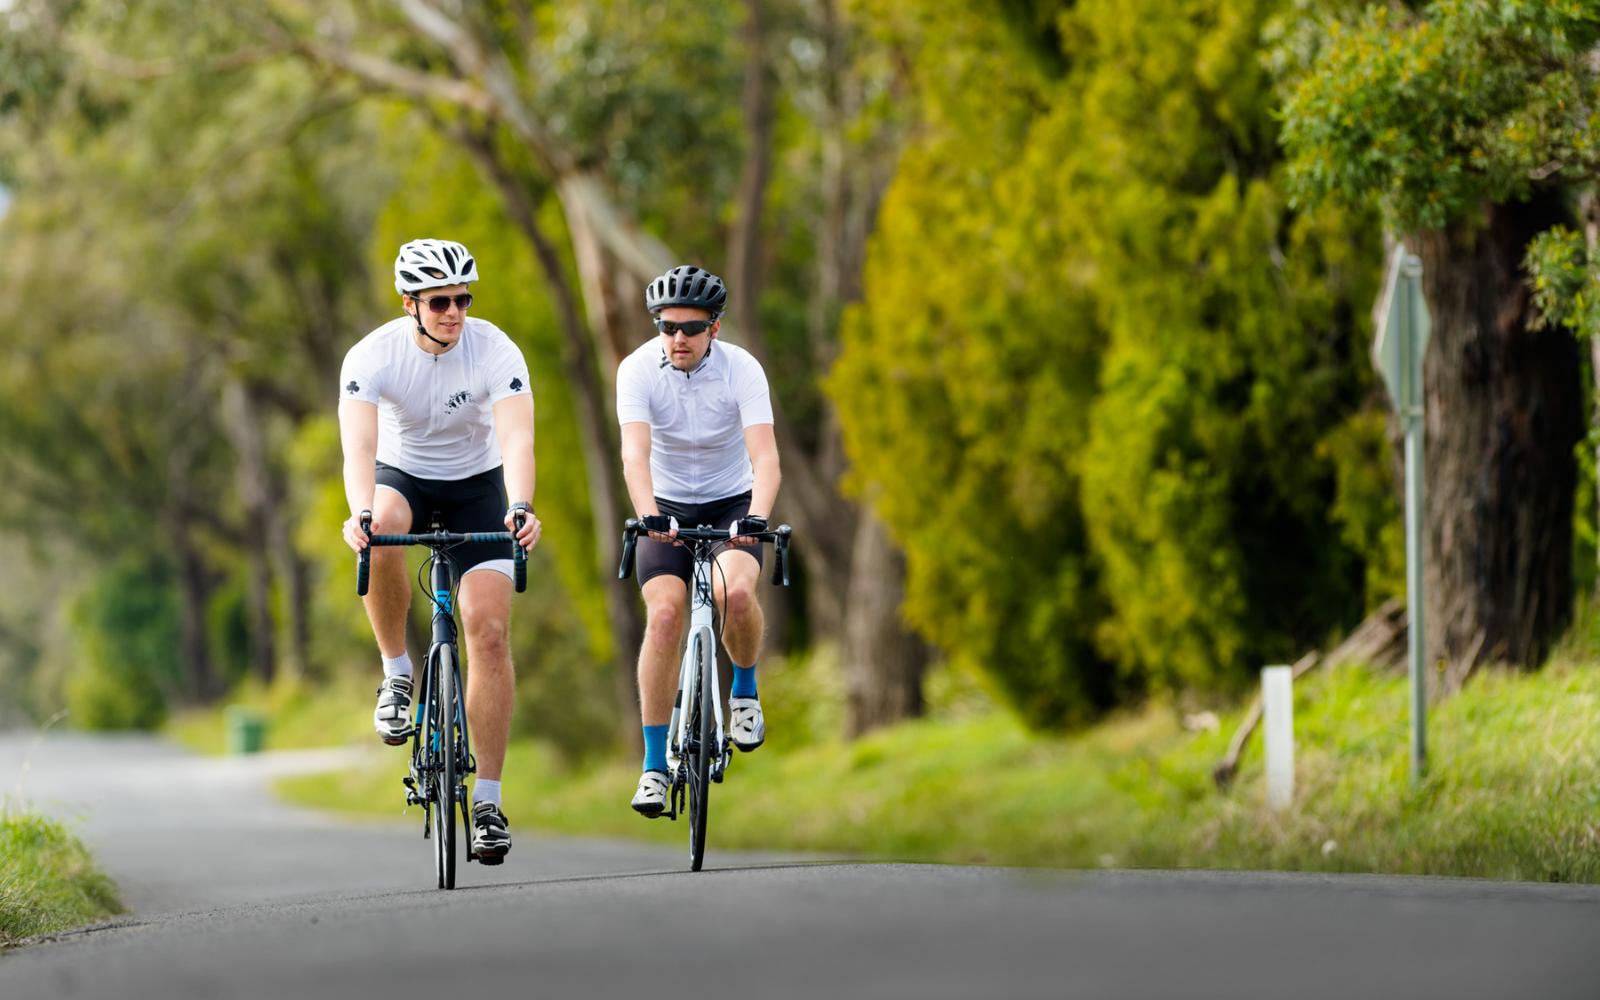 Copy of Copy of Lifestyle images 15 - Reid ® - Vantage Endurance 1.0 Bike